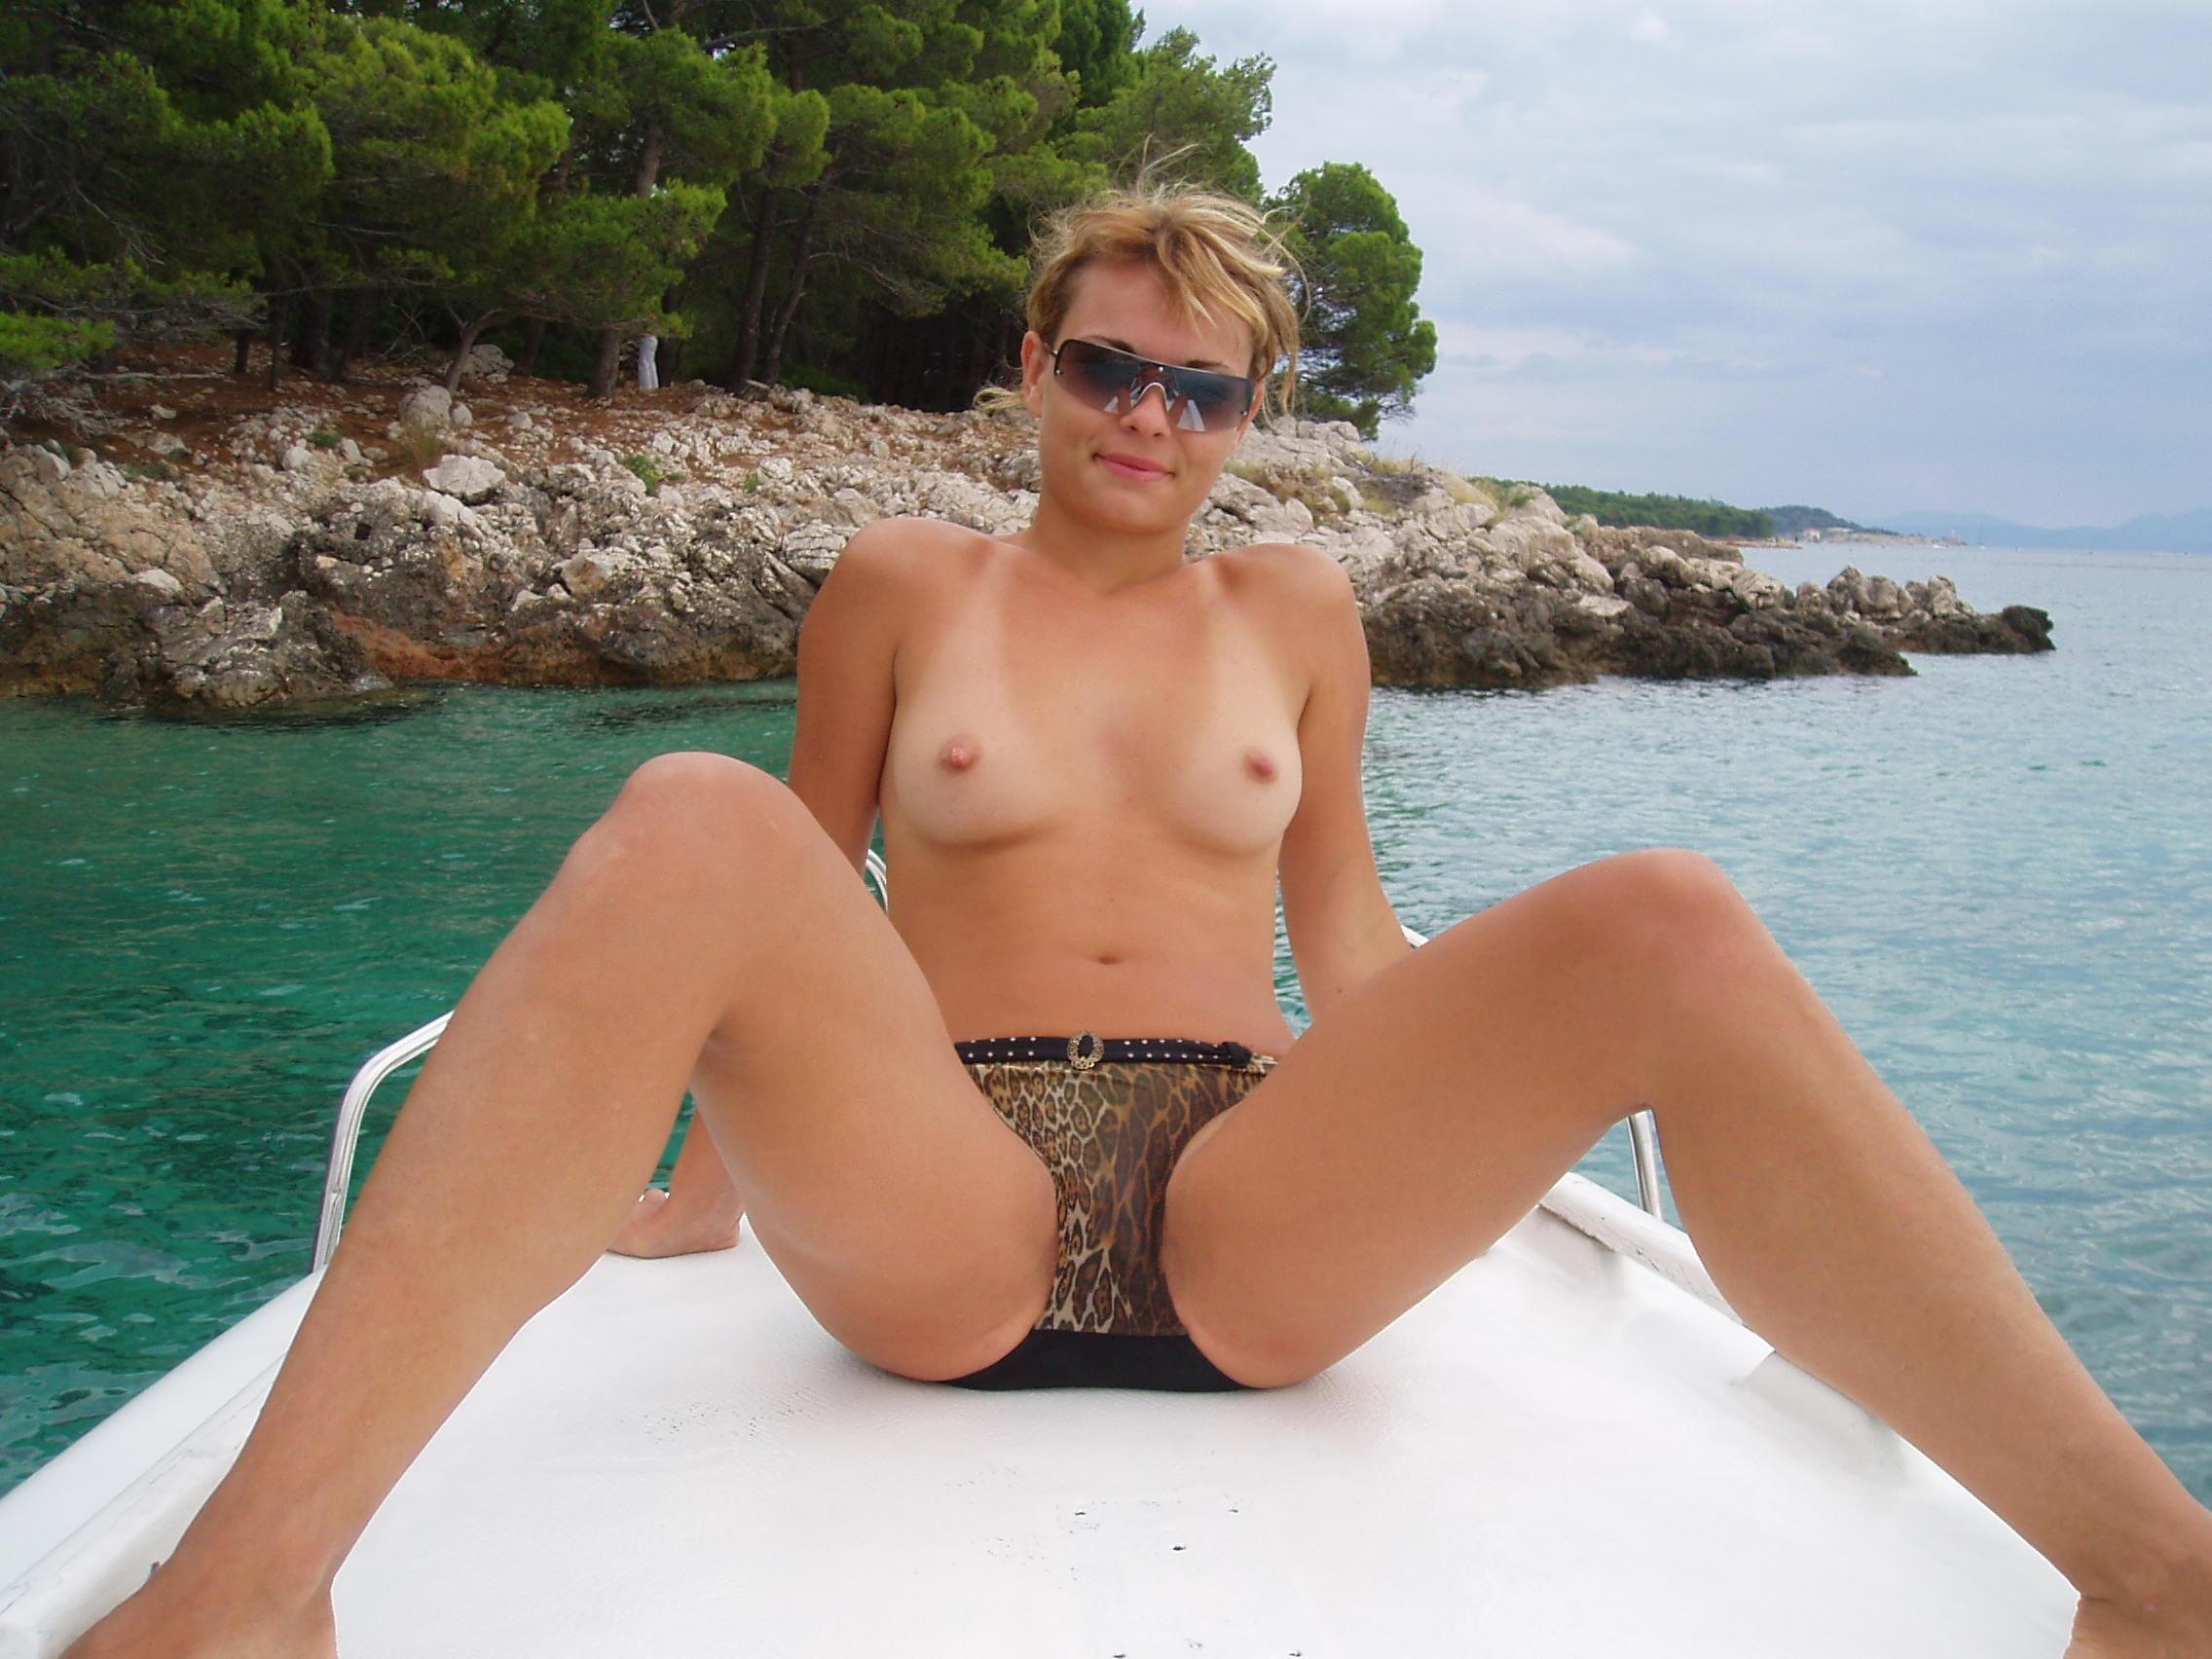 Sexy mature bikini girl voyeur